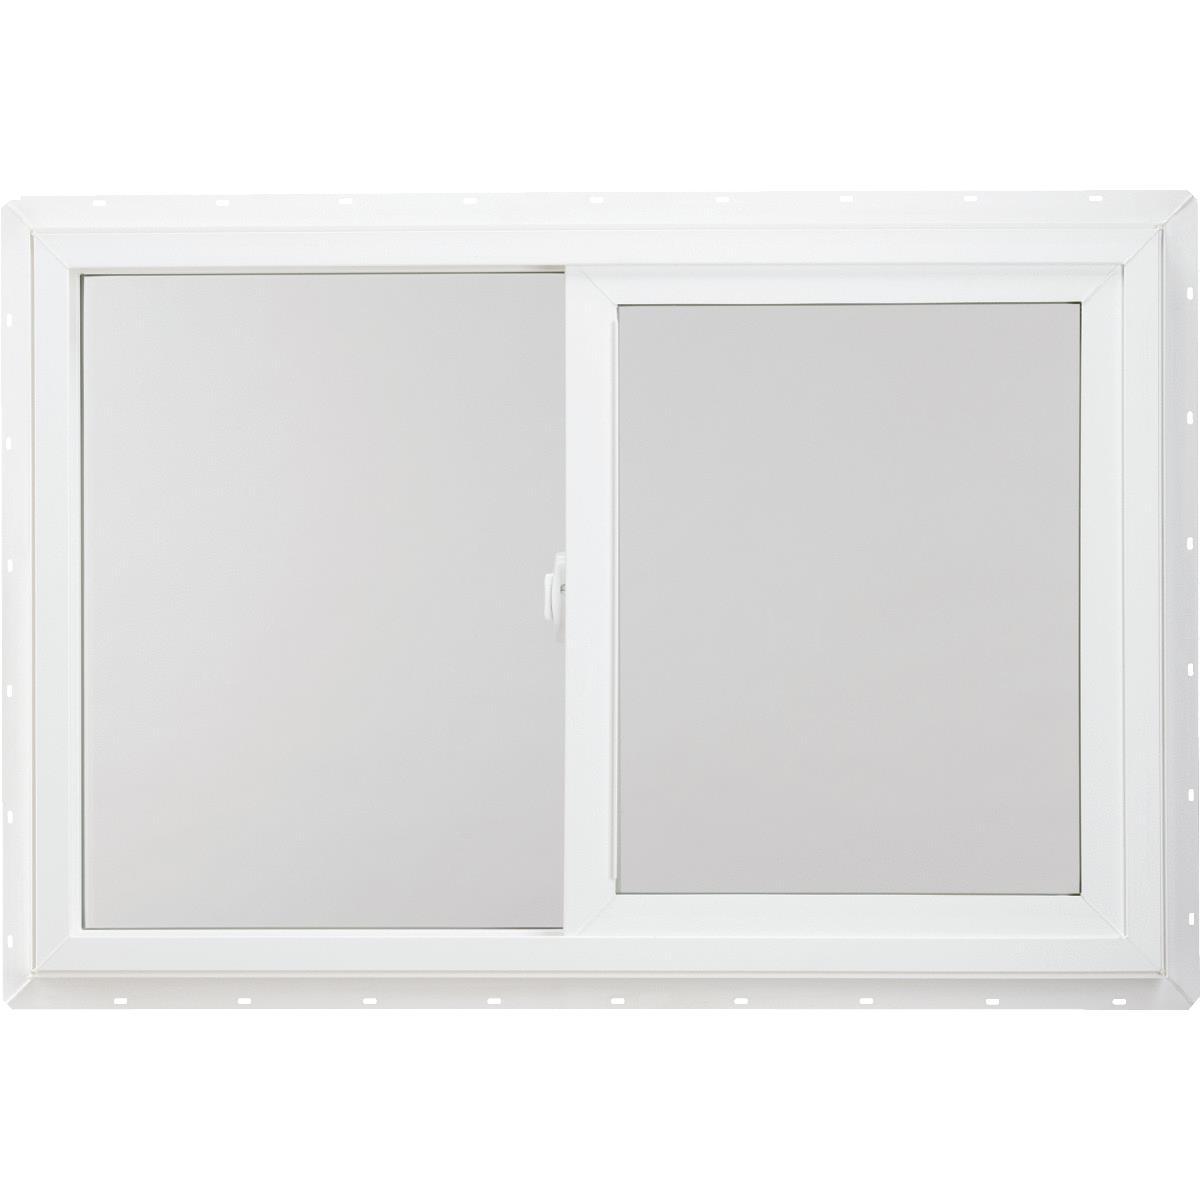 Buy Silver Line Series 2800 New Construction Vinyl Sliding